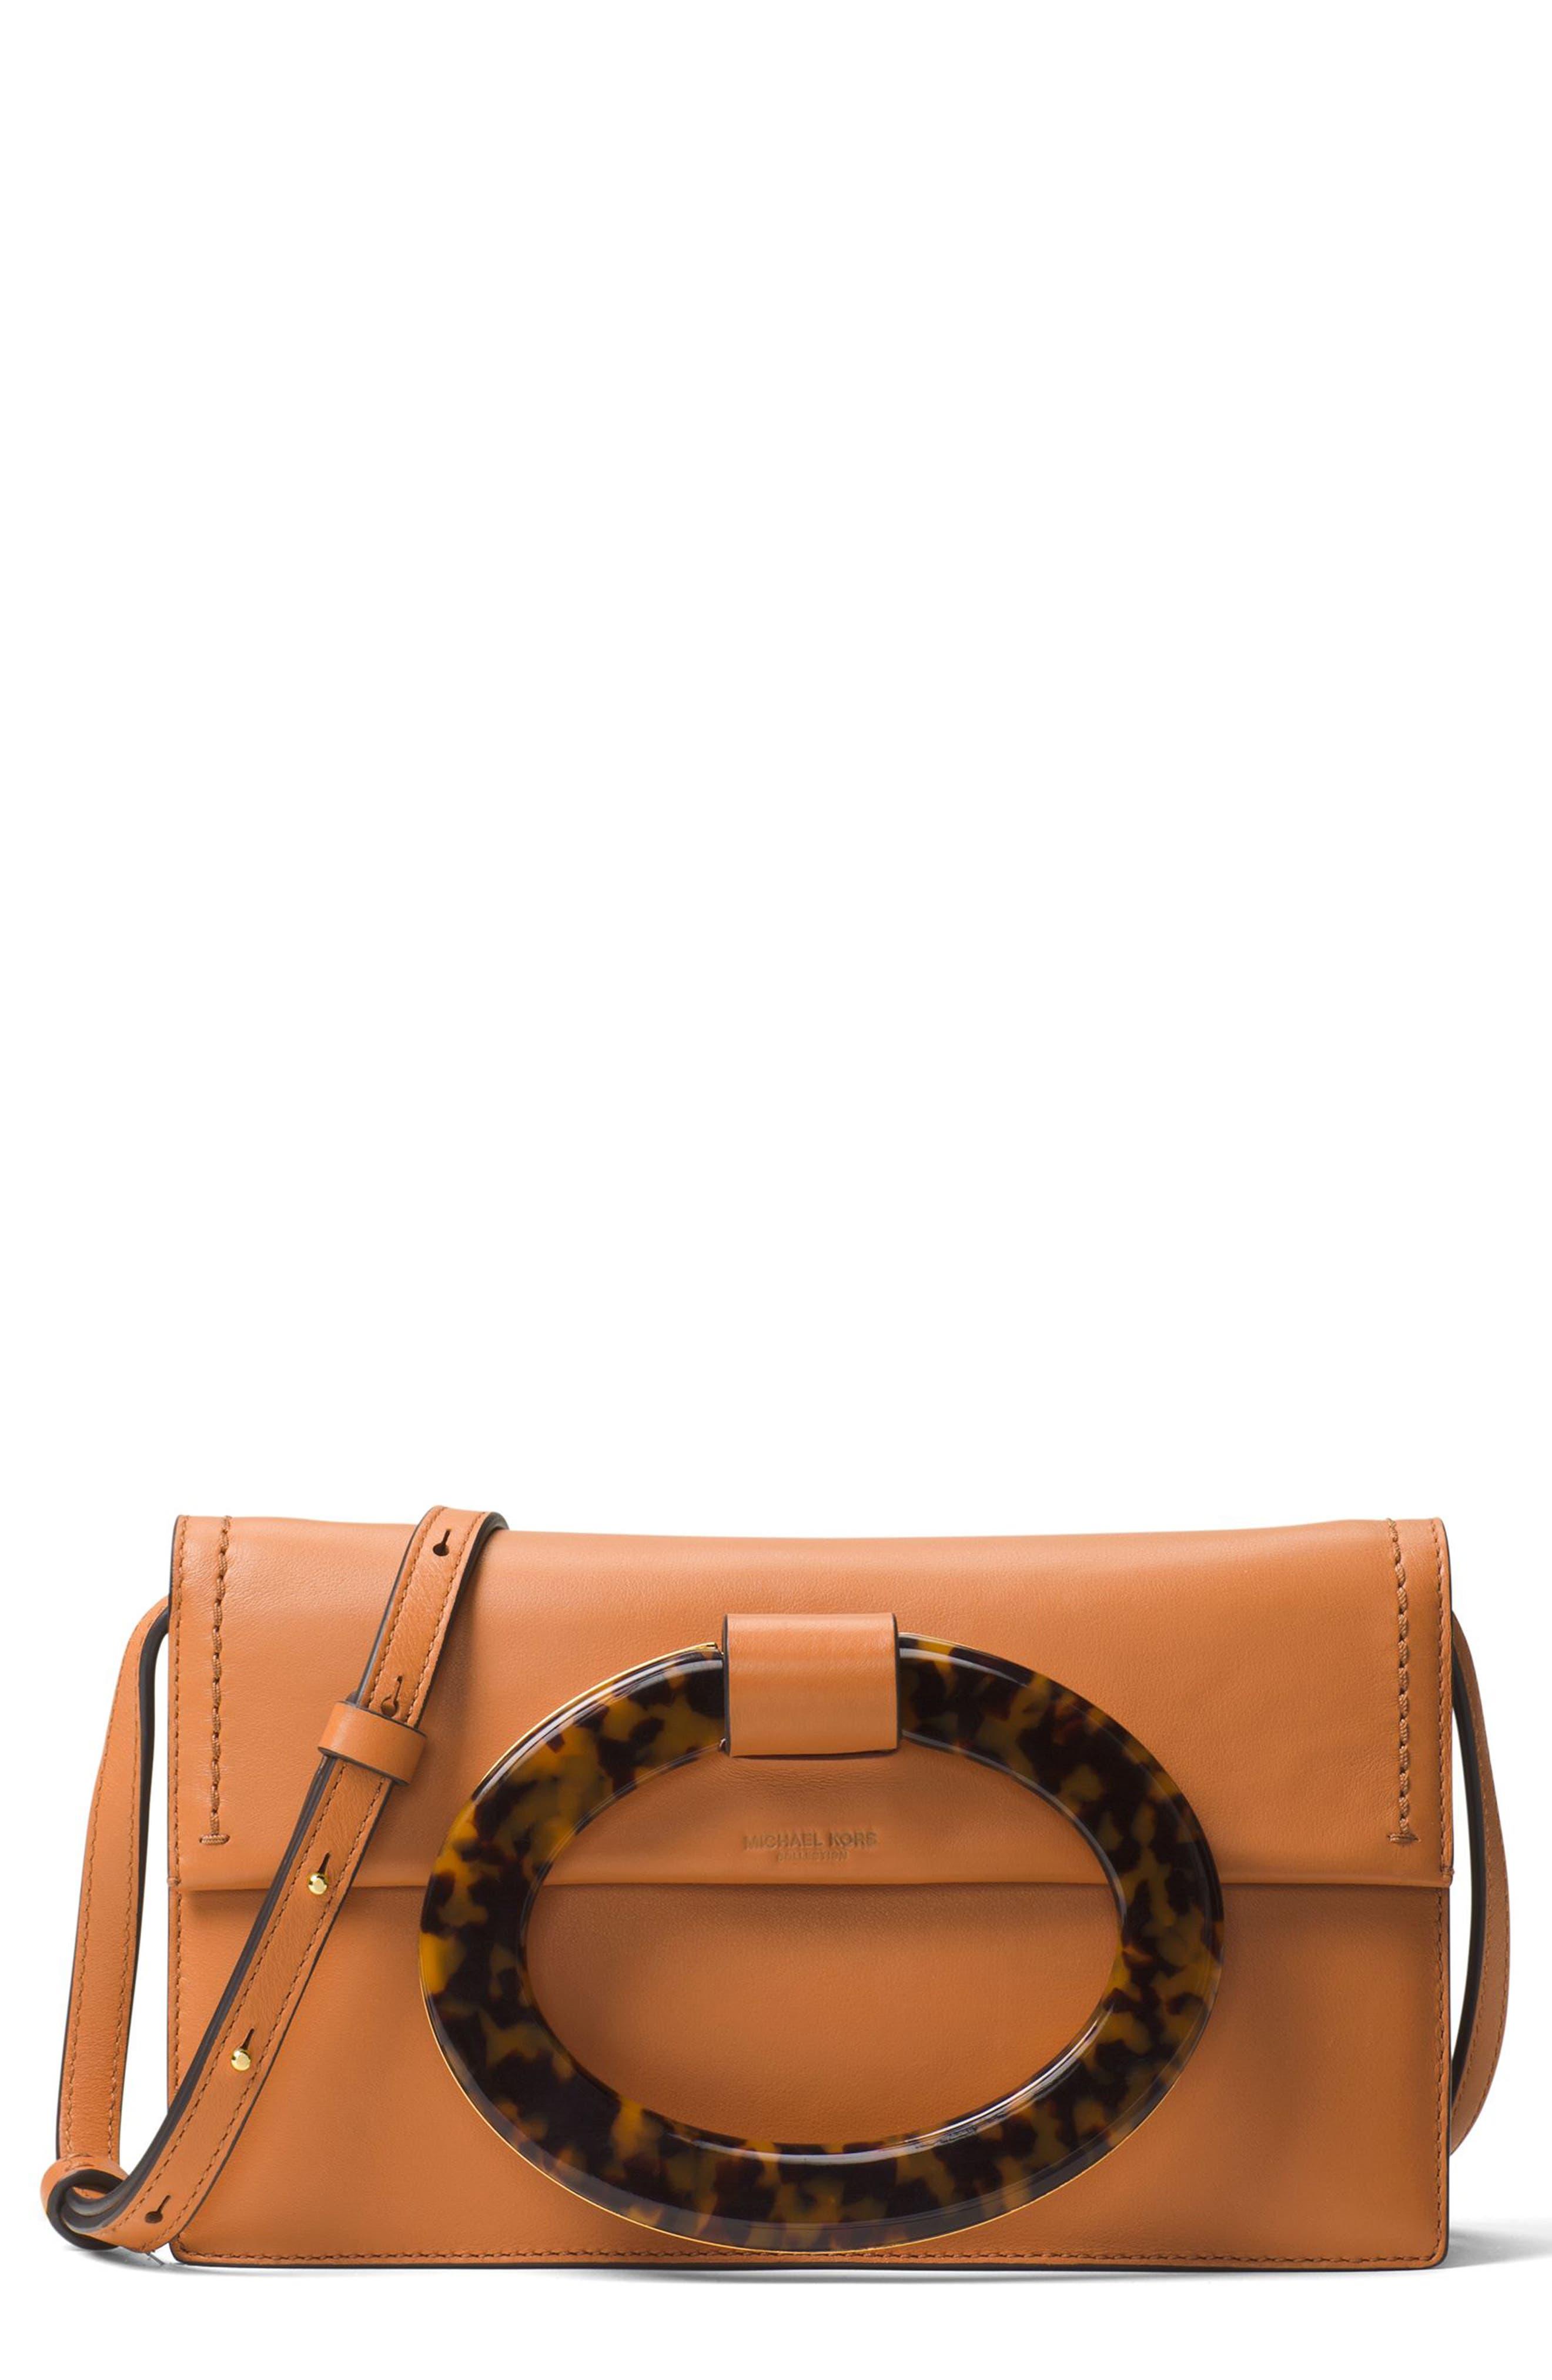 Alternate Image 1 Selected - Michael Kors Baxter Calfskin Leather Convertible Clutch